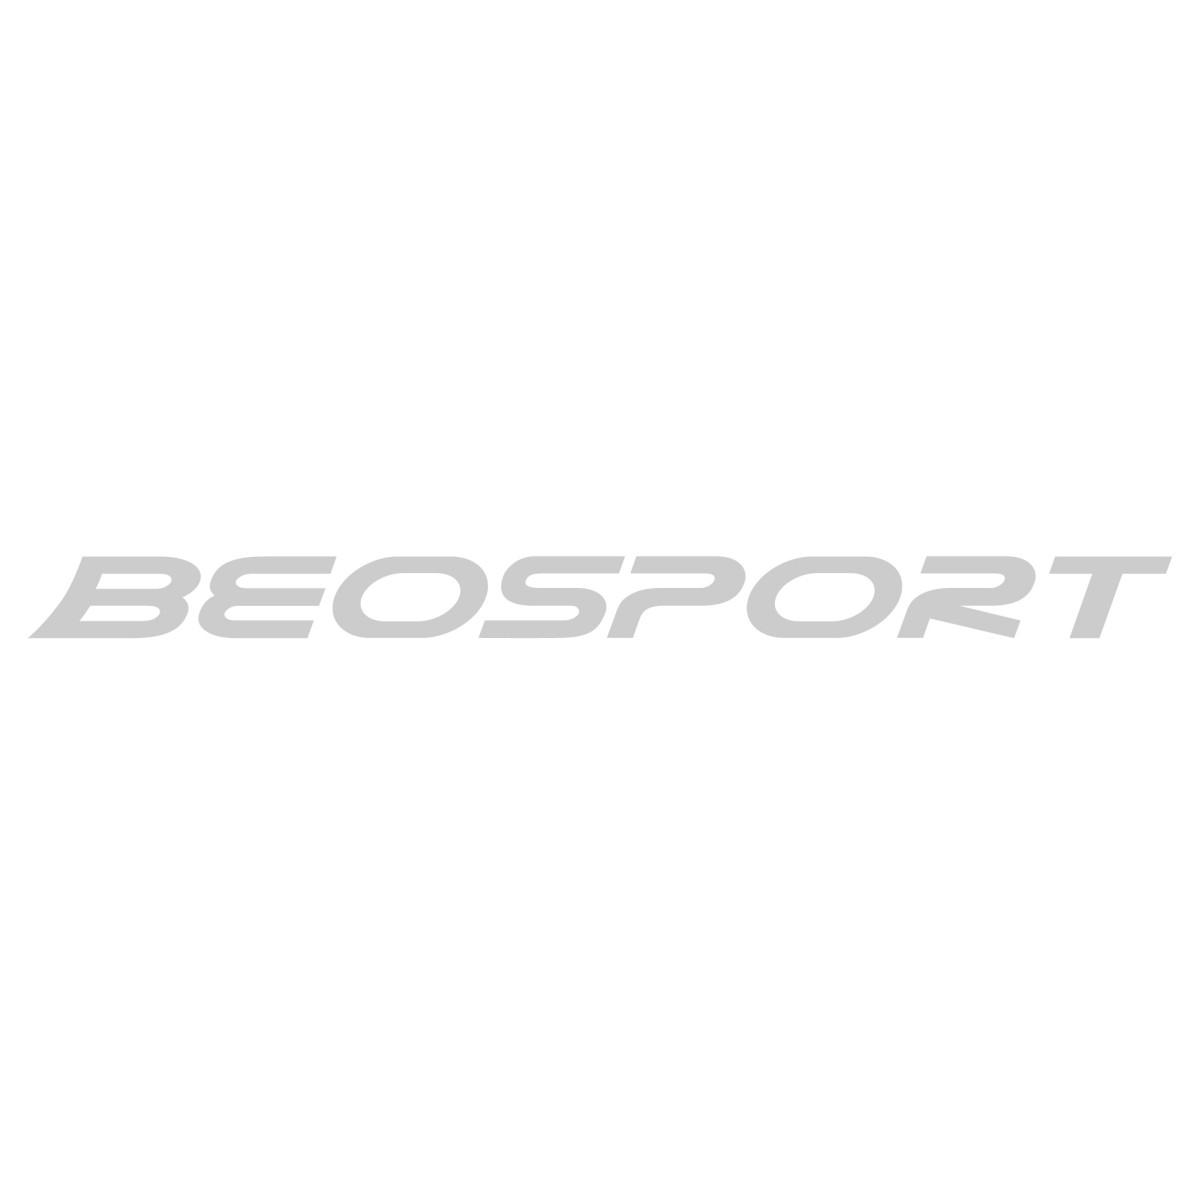 Wilson Alu Power Rg 200m Bronze 1.28mm žica za reket